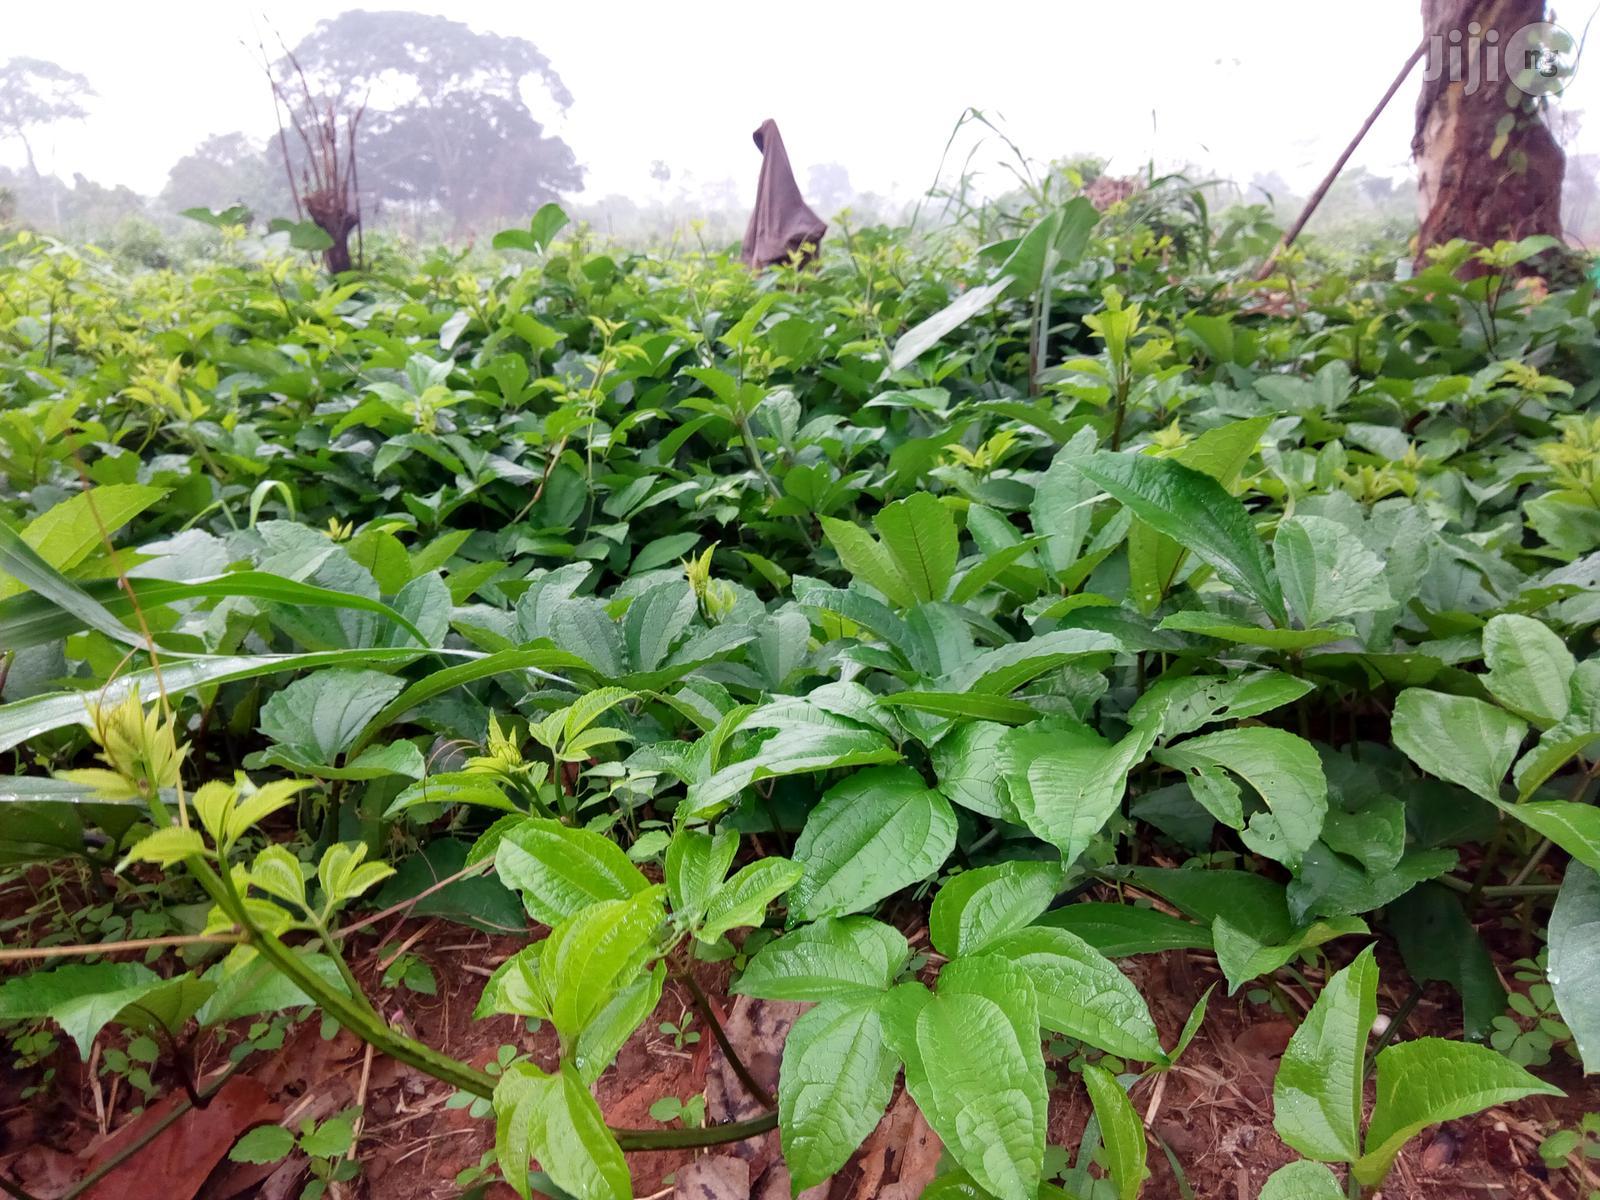 Archive: Buy Ugu (Ugwu) Fluted Pumpkin Leaves And Seeds